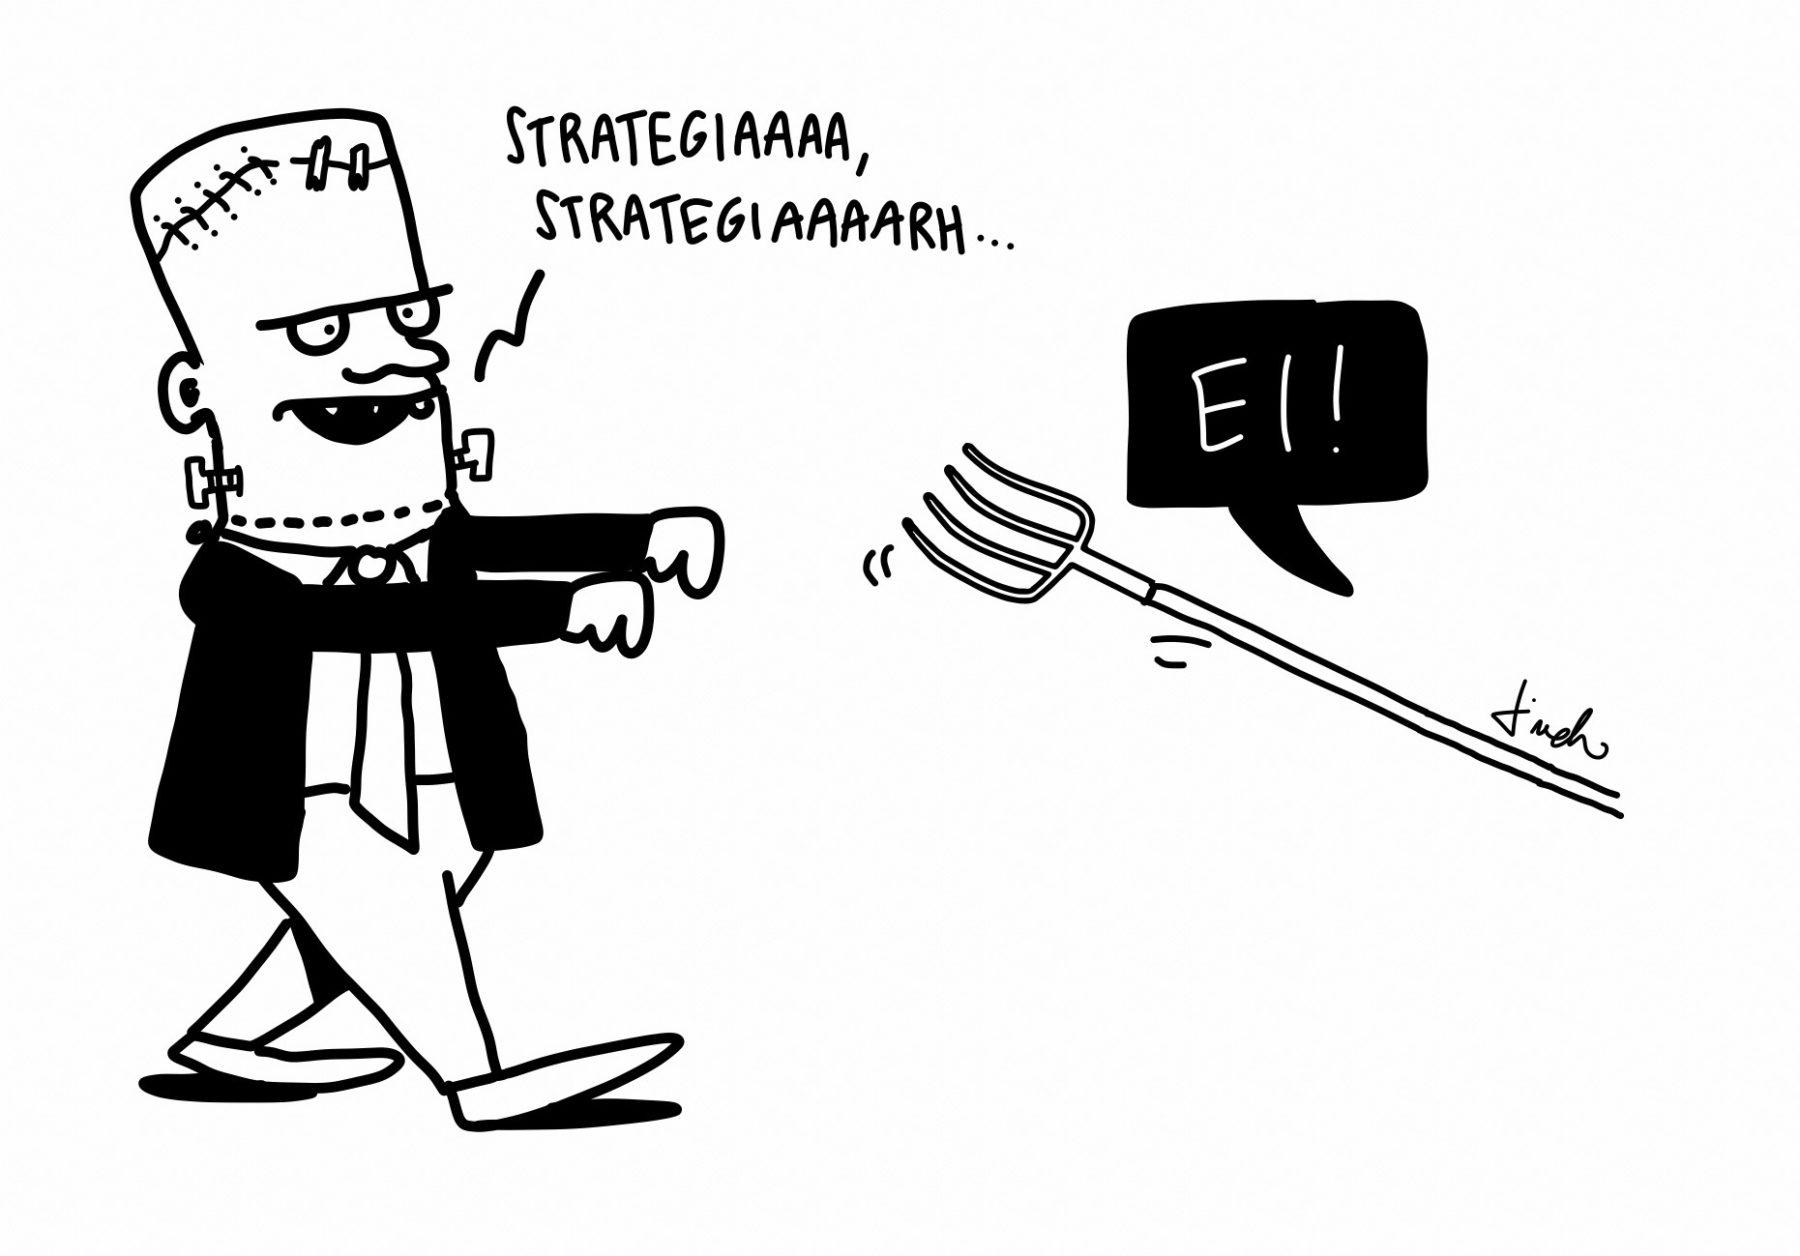 Miksi kuvitettu strategia?